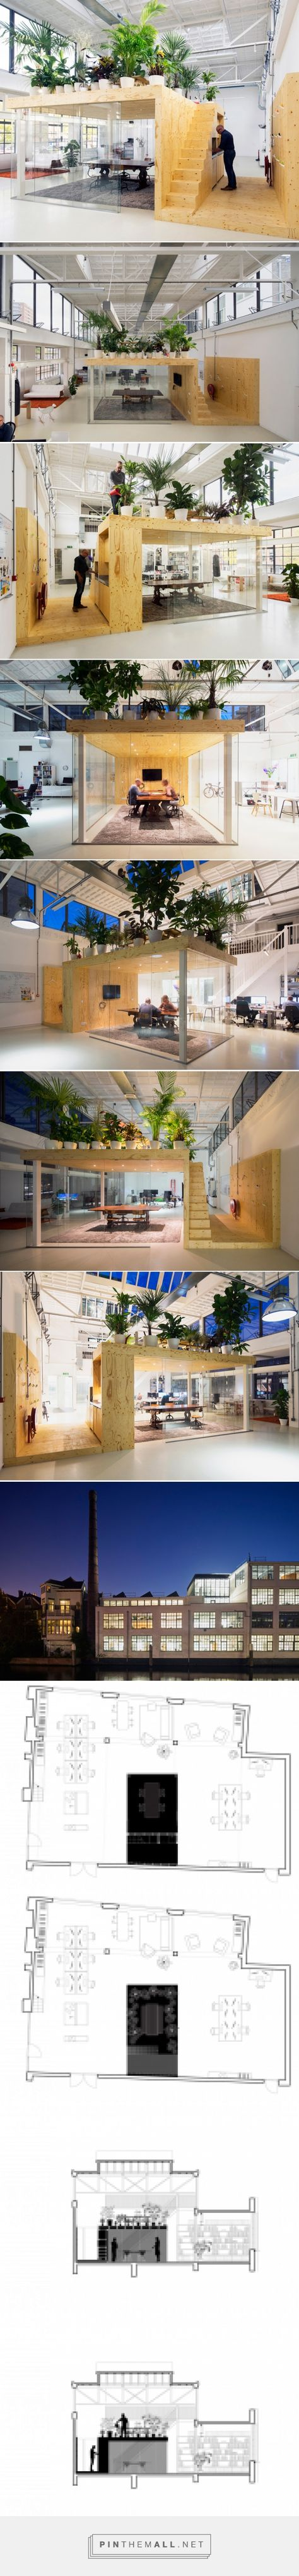 jvantspijker's renovated office includes an indoor garden... - a grouped images picture